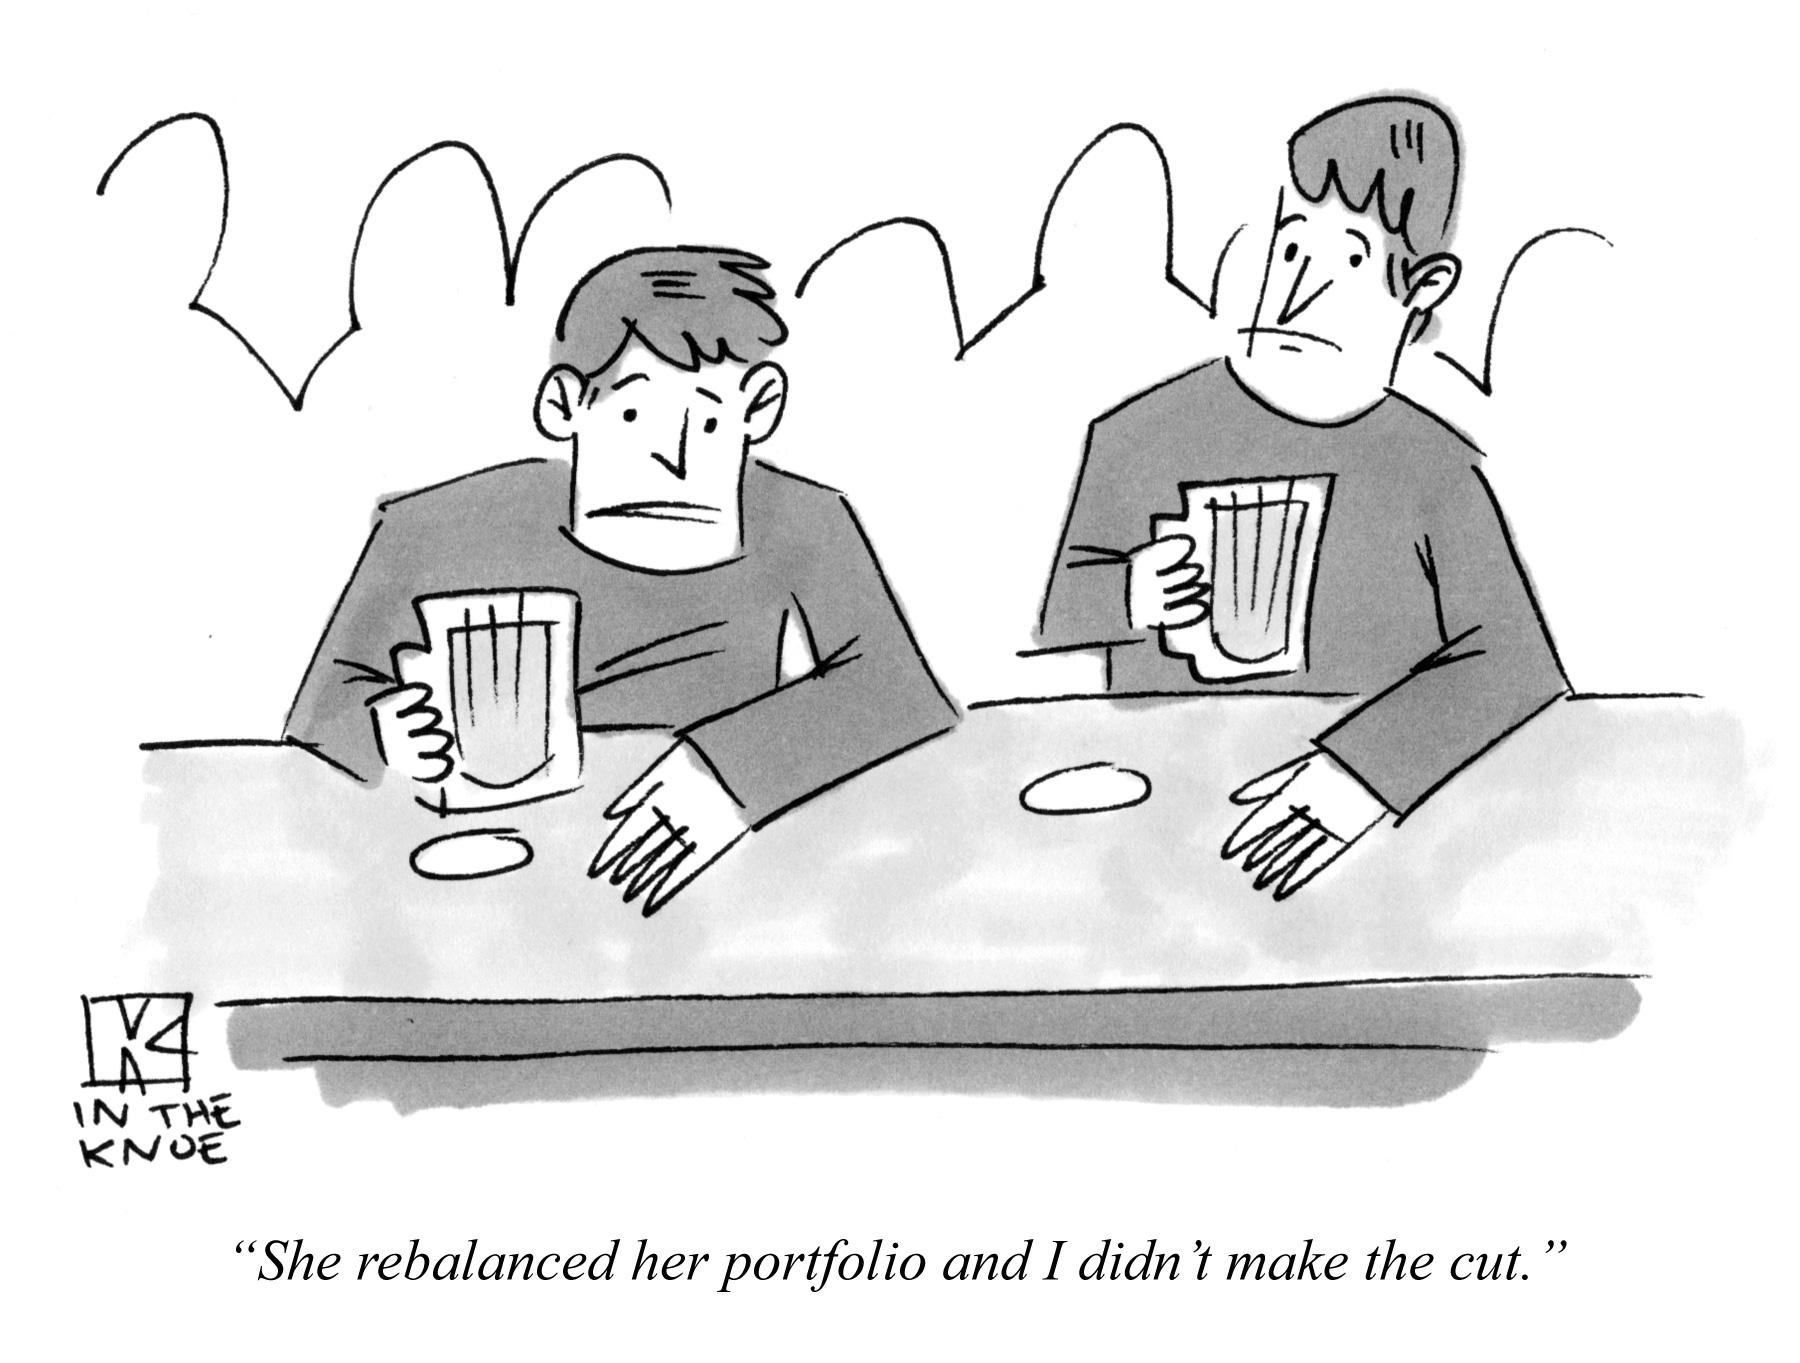 She rebalanced her portfolio and I didn't make the cut.